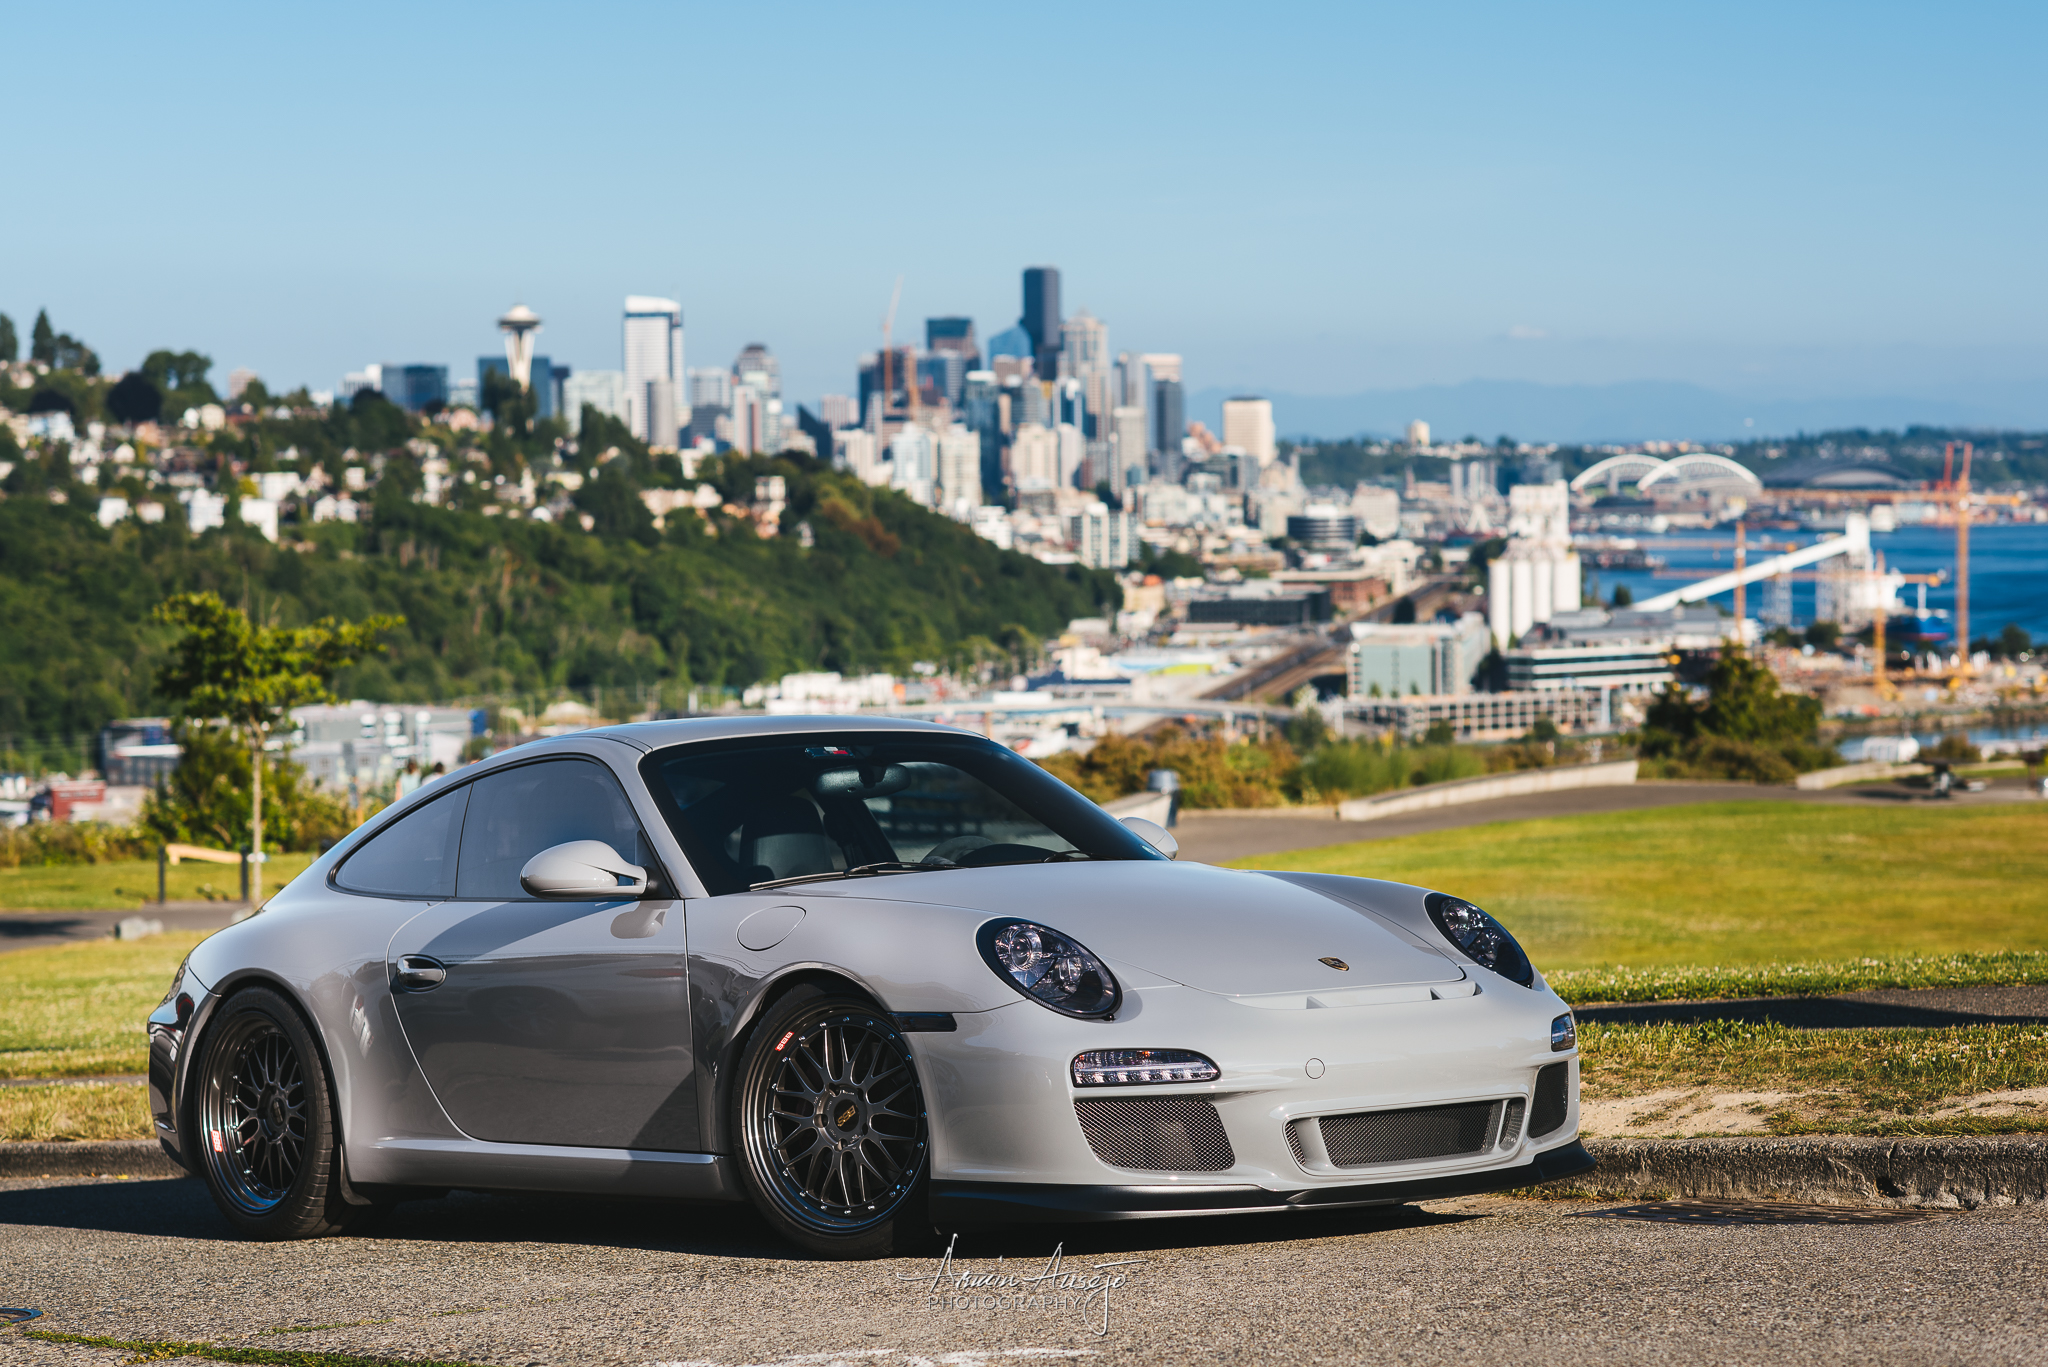 Rheena's Porsche 911